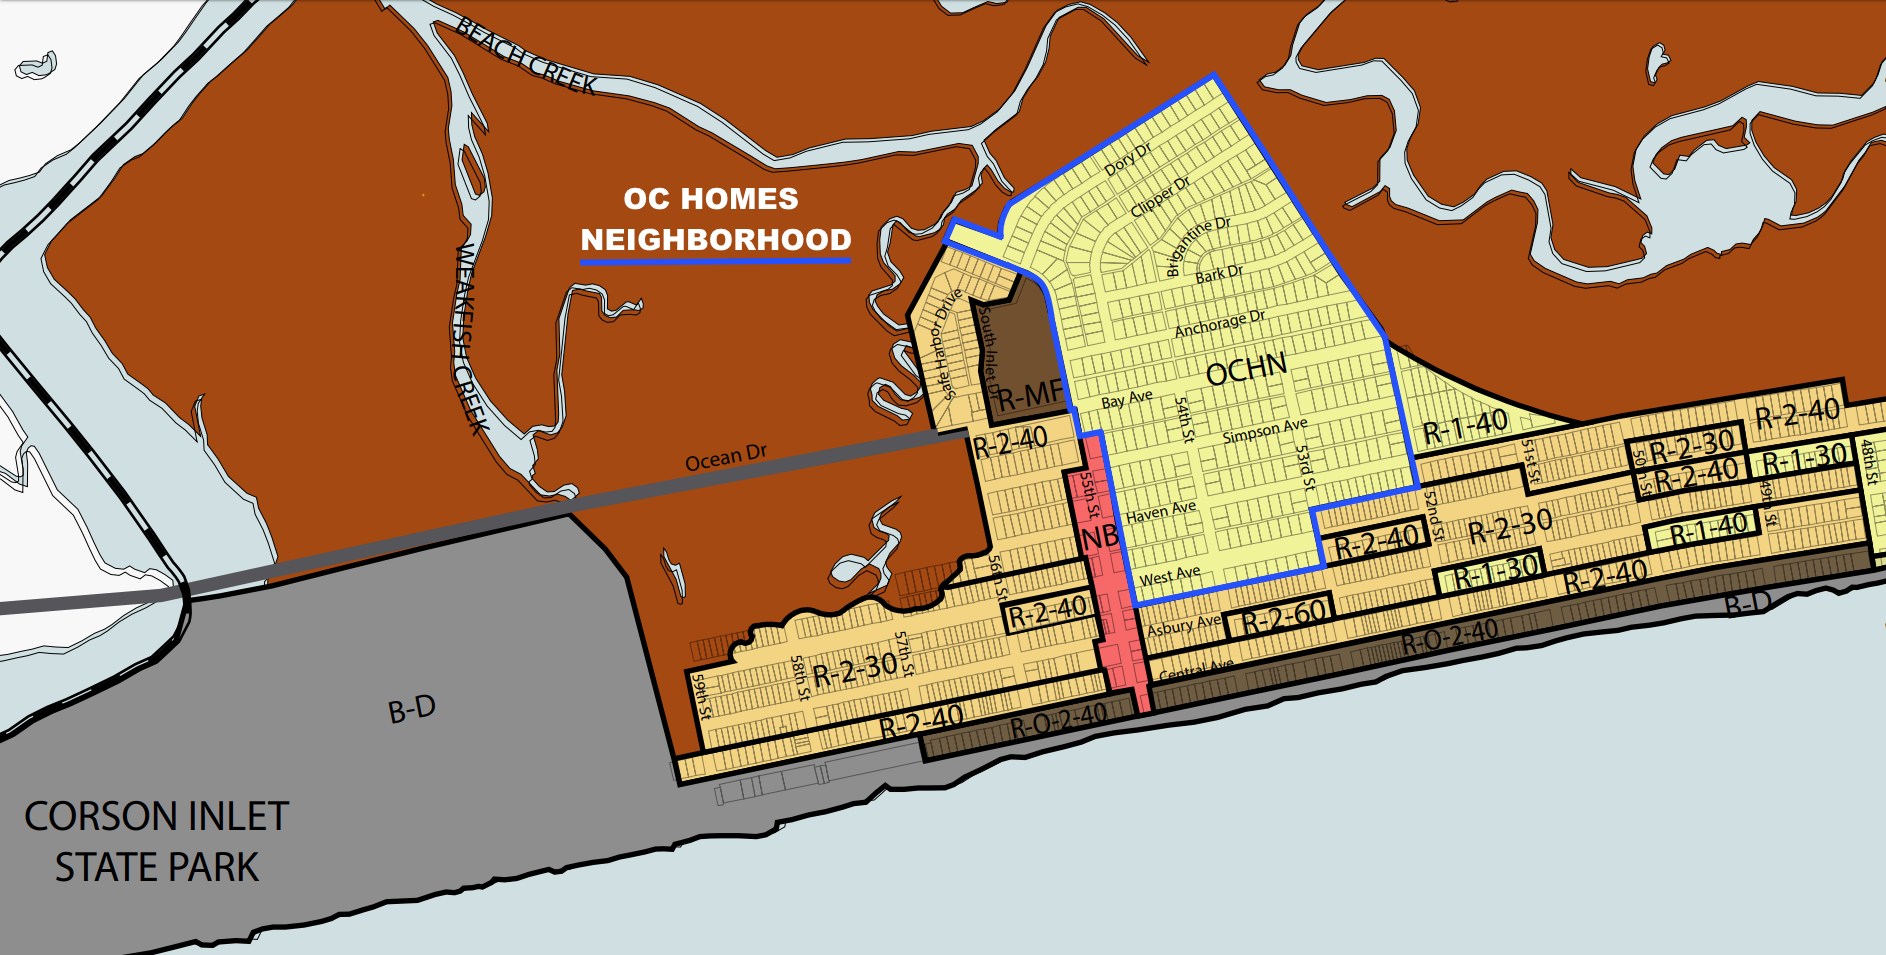 OCNJ OC Homes Map